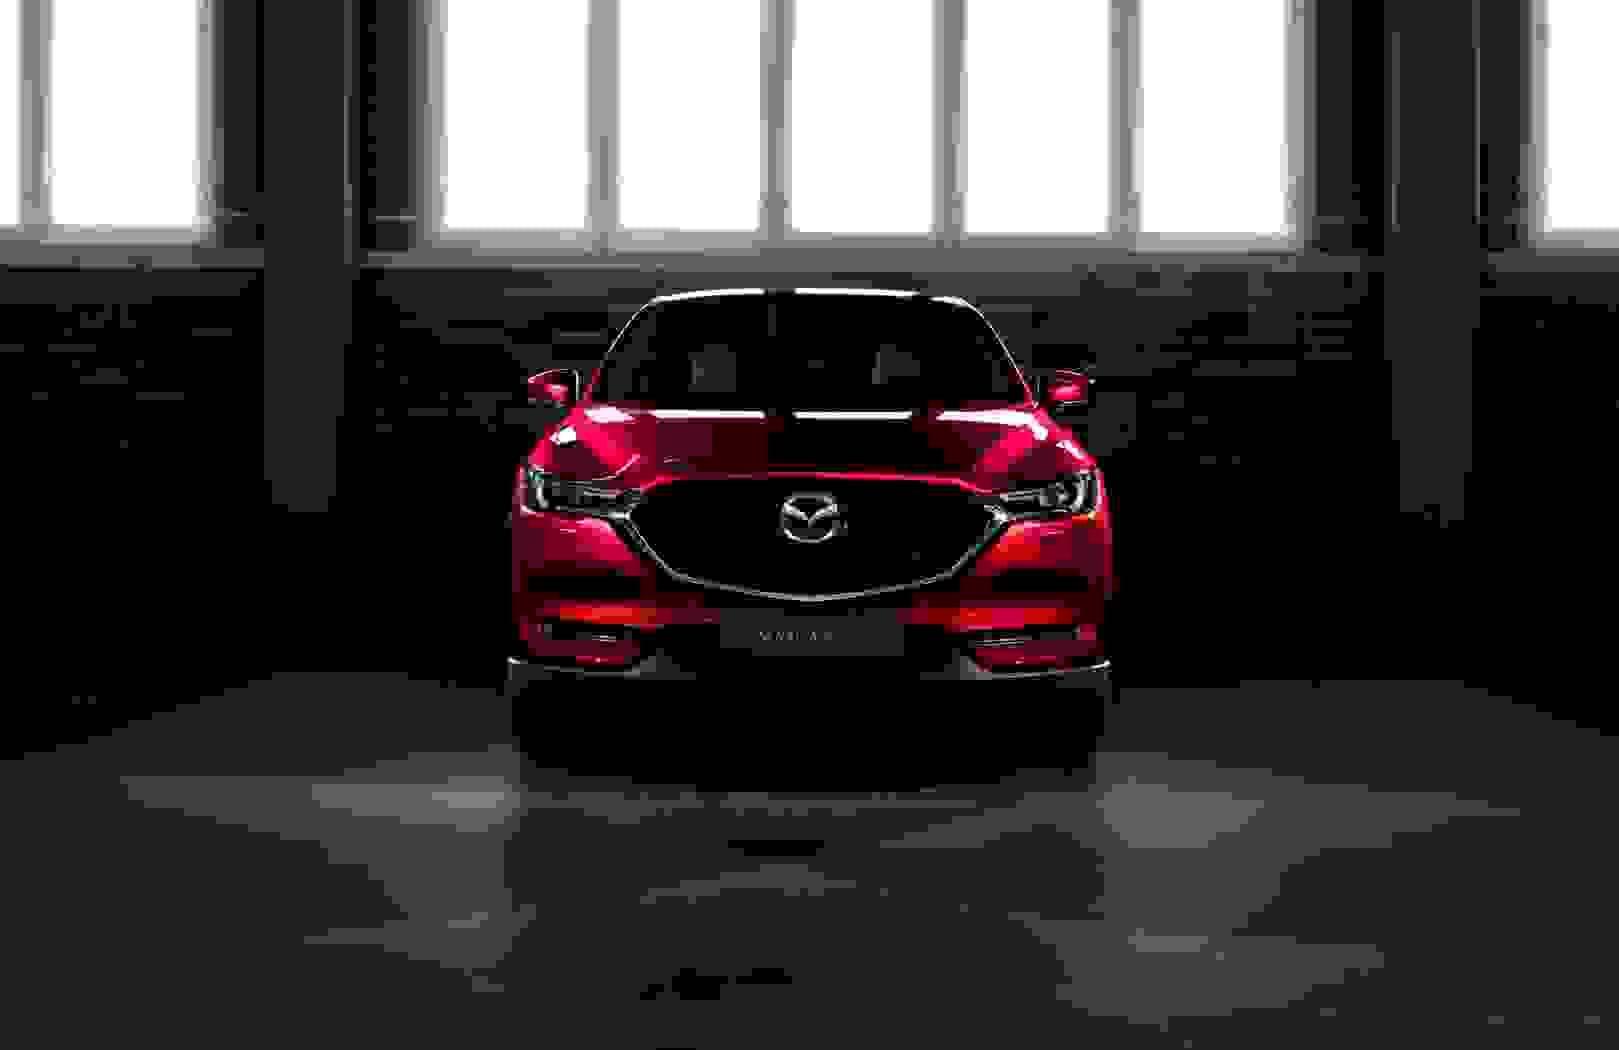 2020 Mazda CX 5 Exterior 8 5